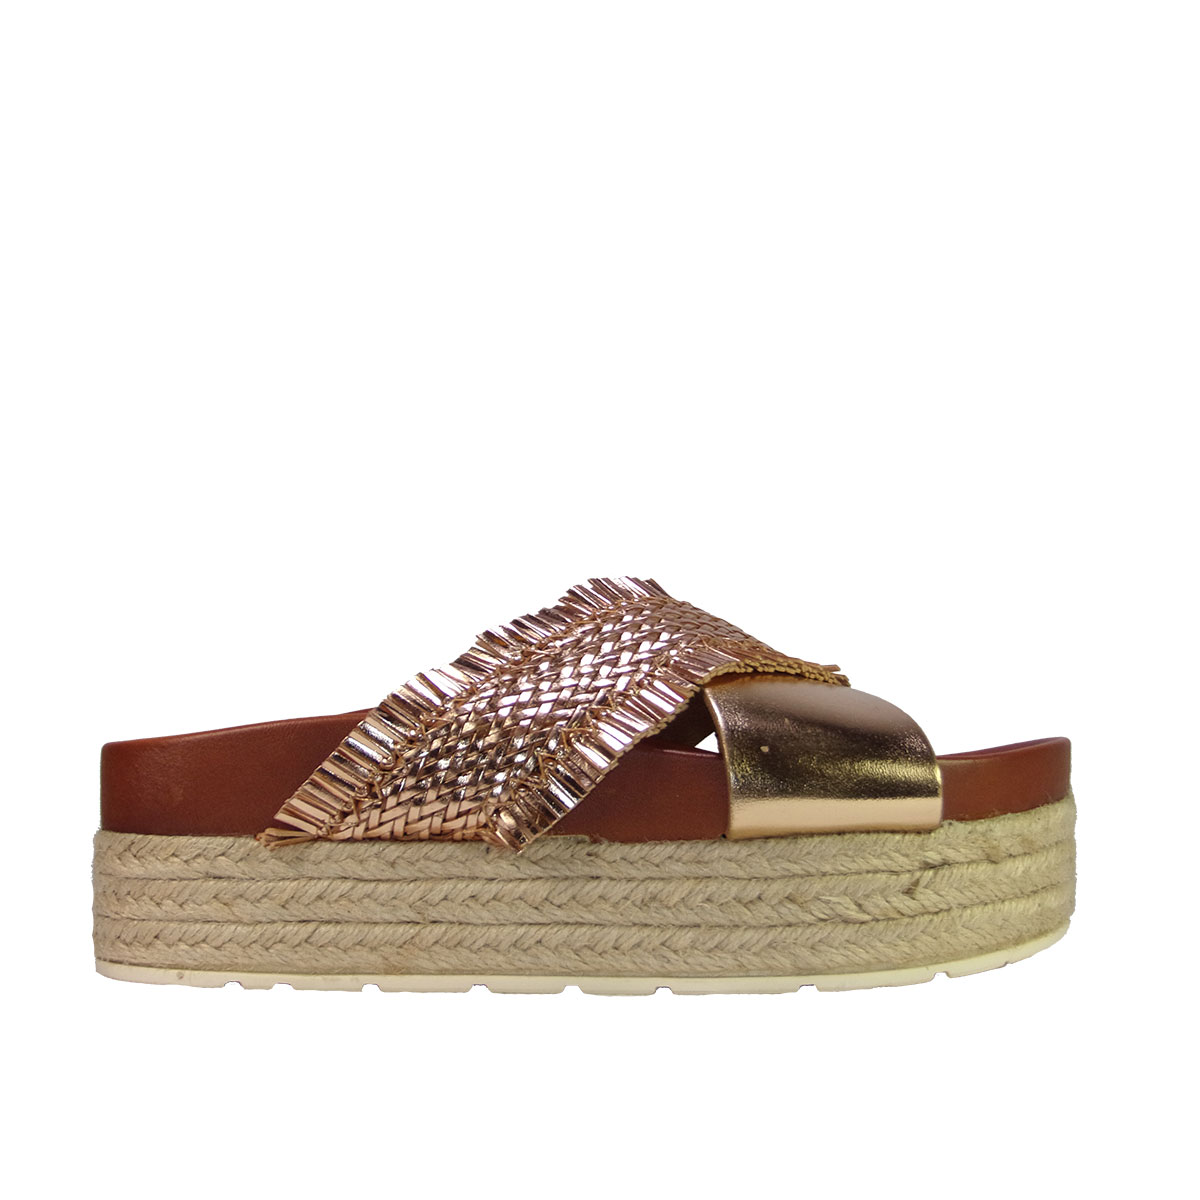 eee99d9bd07 Malika shoes 17060 Γυναικείες Παντόφλες Flatforms Ροζ Χρυσό